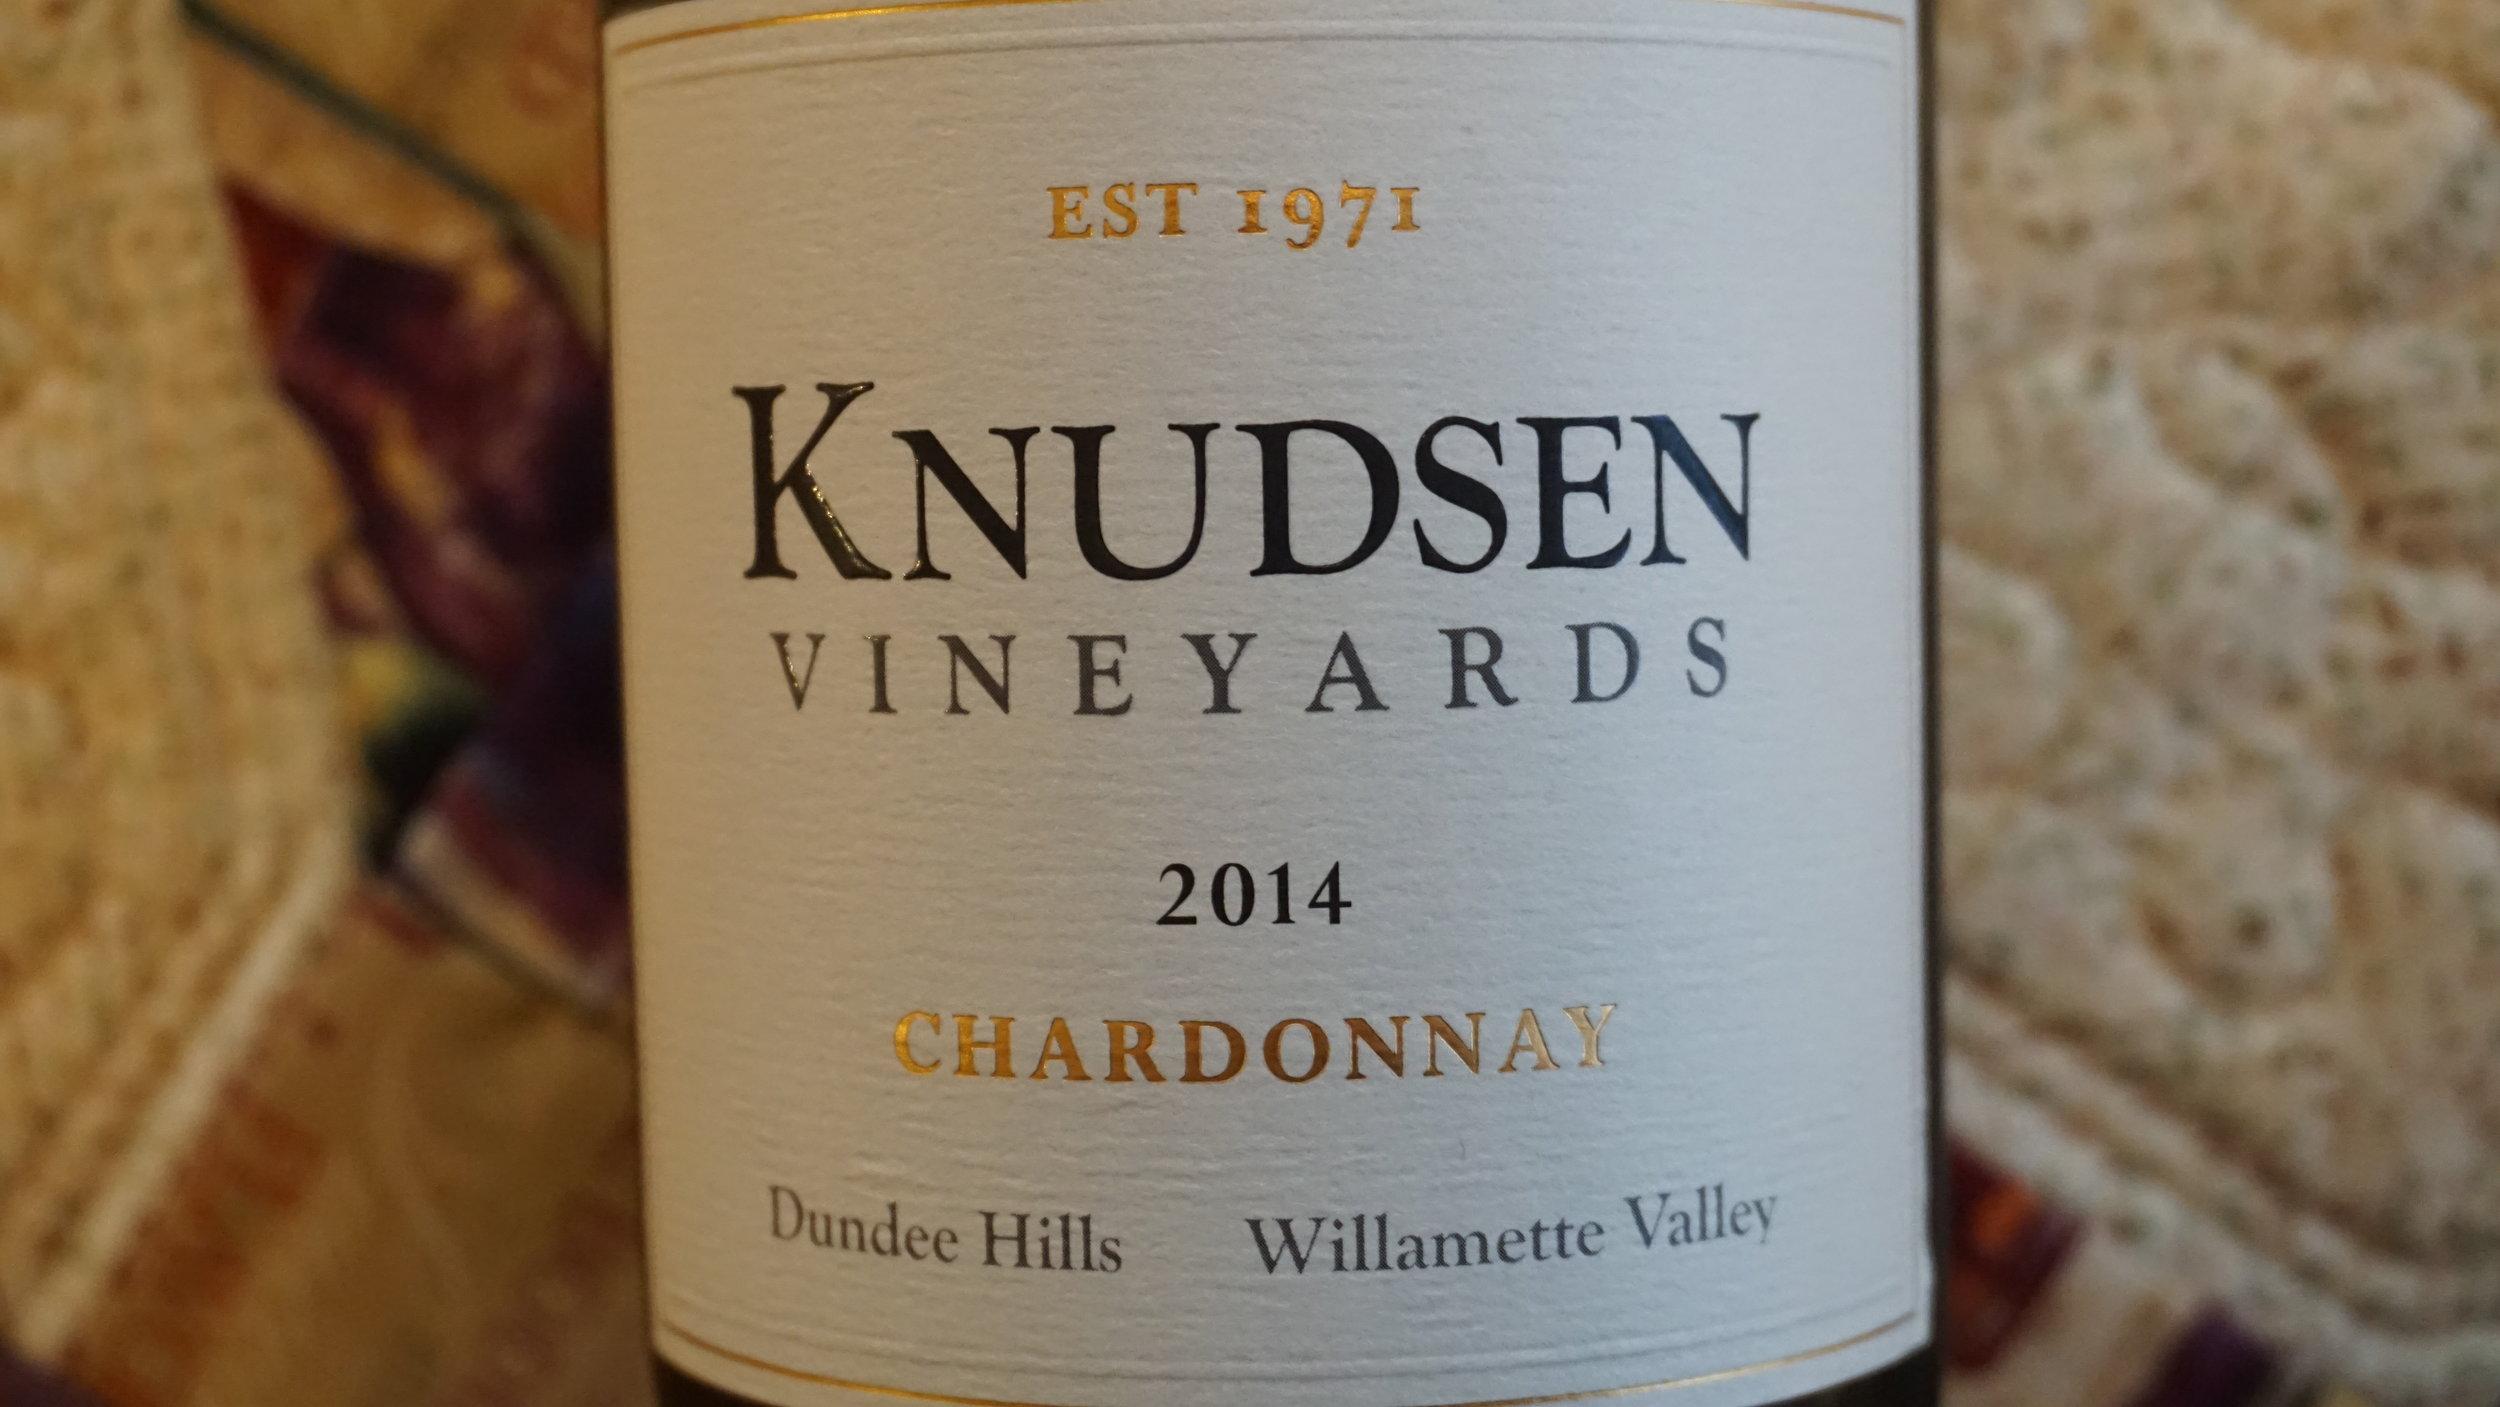 Marked acidity makes this is Knudsen Vineyards 2014 Chardonnay a very food-friendly wine. Viki Eierdam